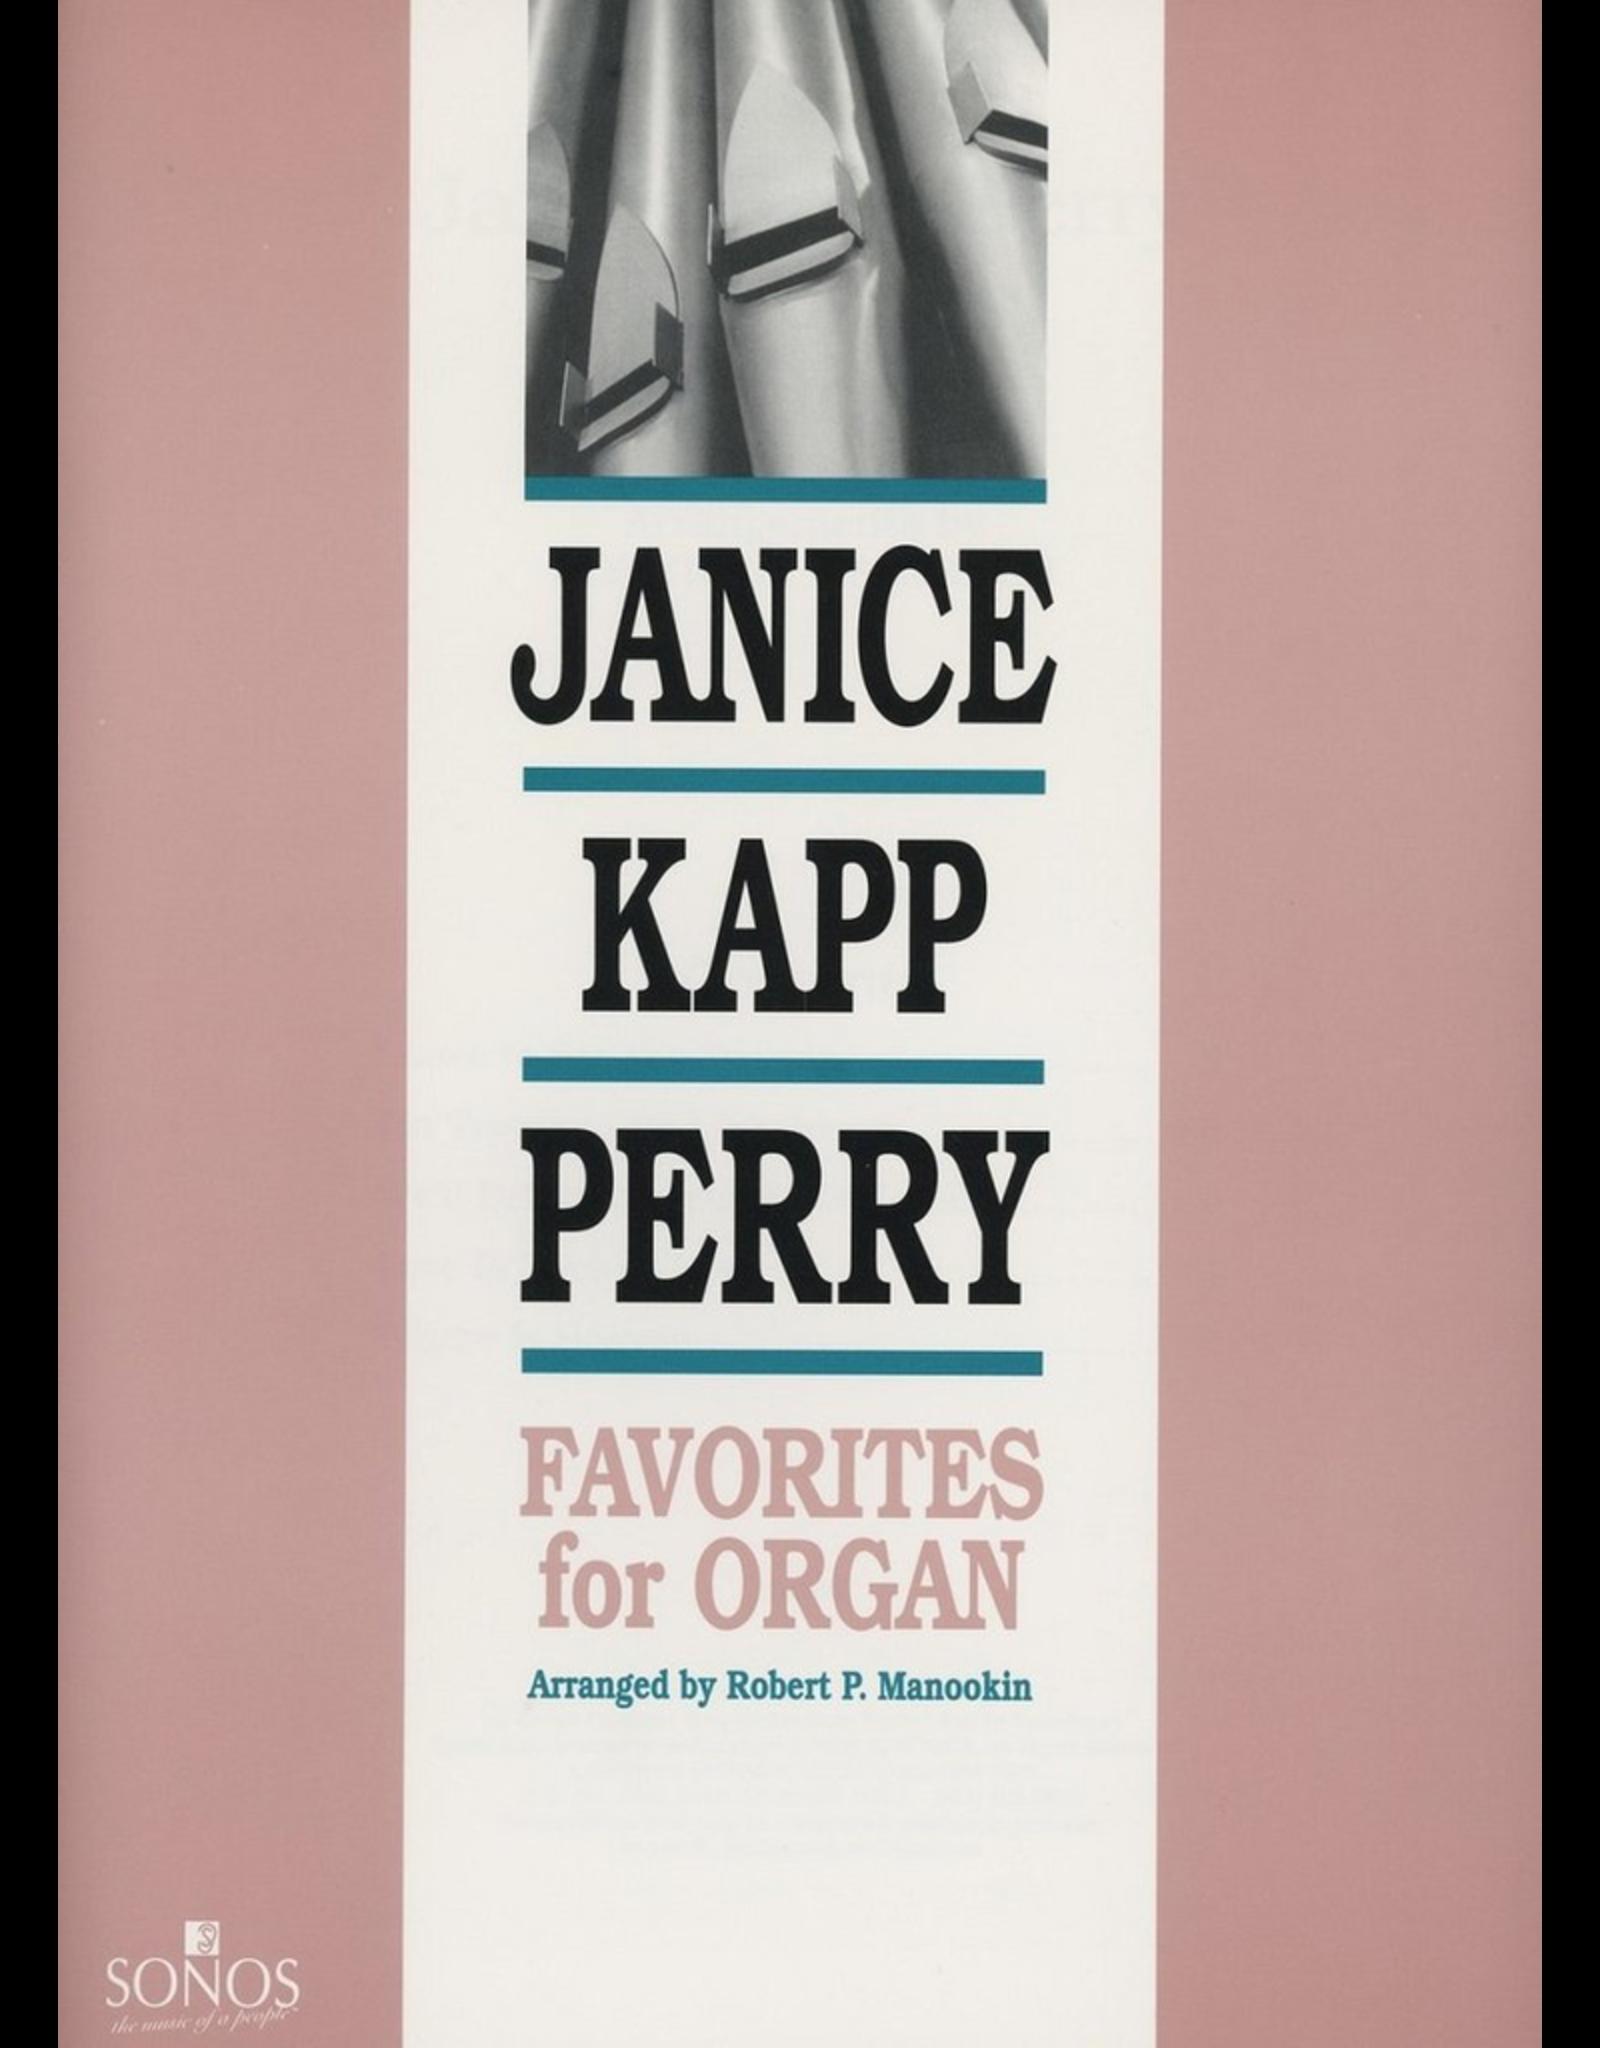 Jackman Music Janice Kapp Perry Favorites for Organ